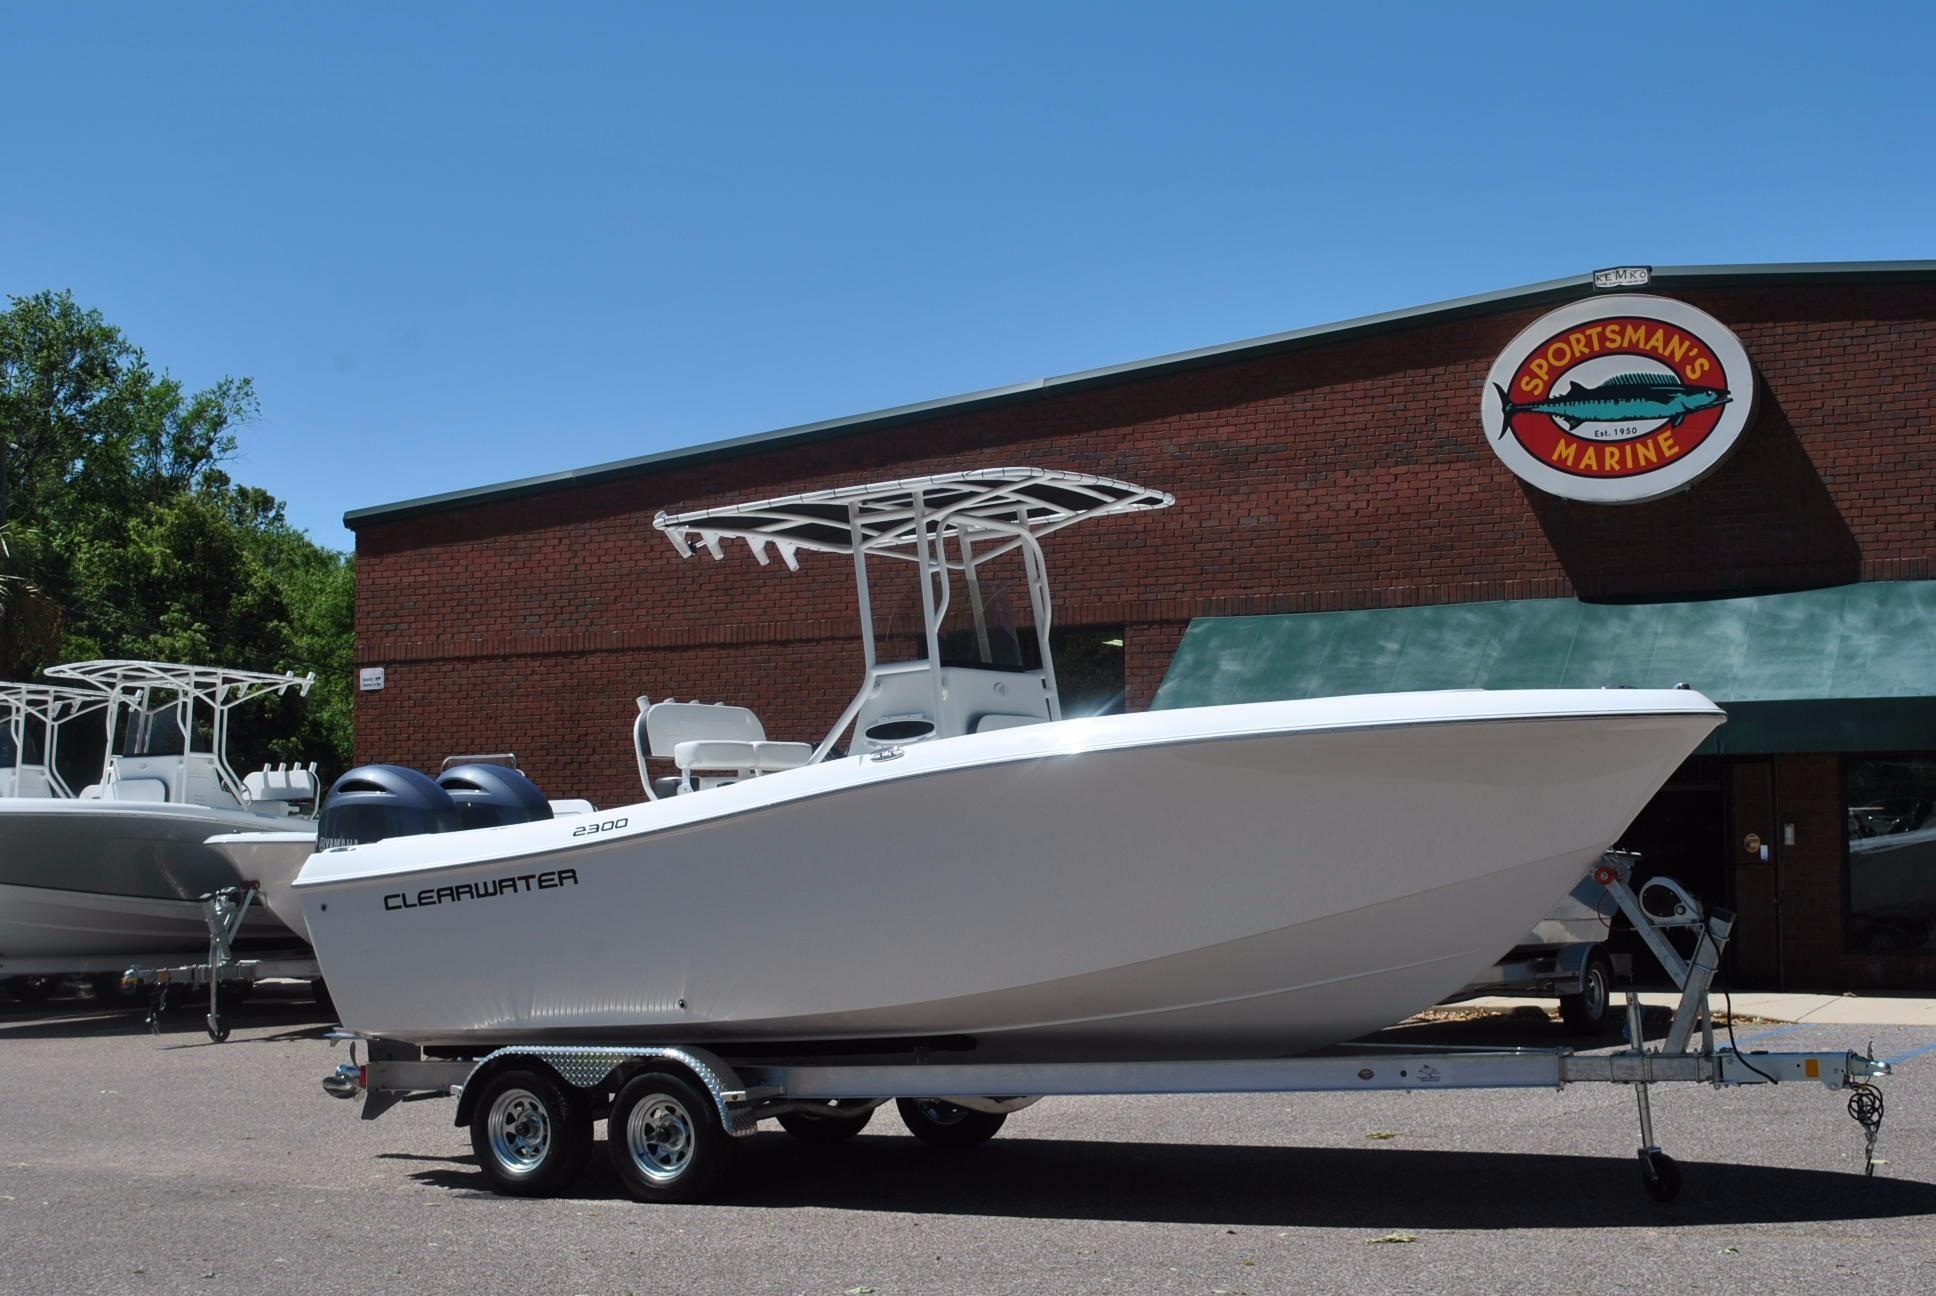 2017 Clearwater 2300 Cc White Motor Boot Zum Verkauf